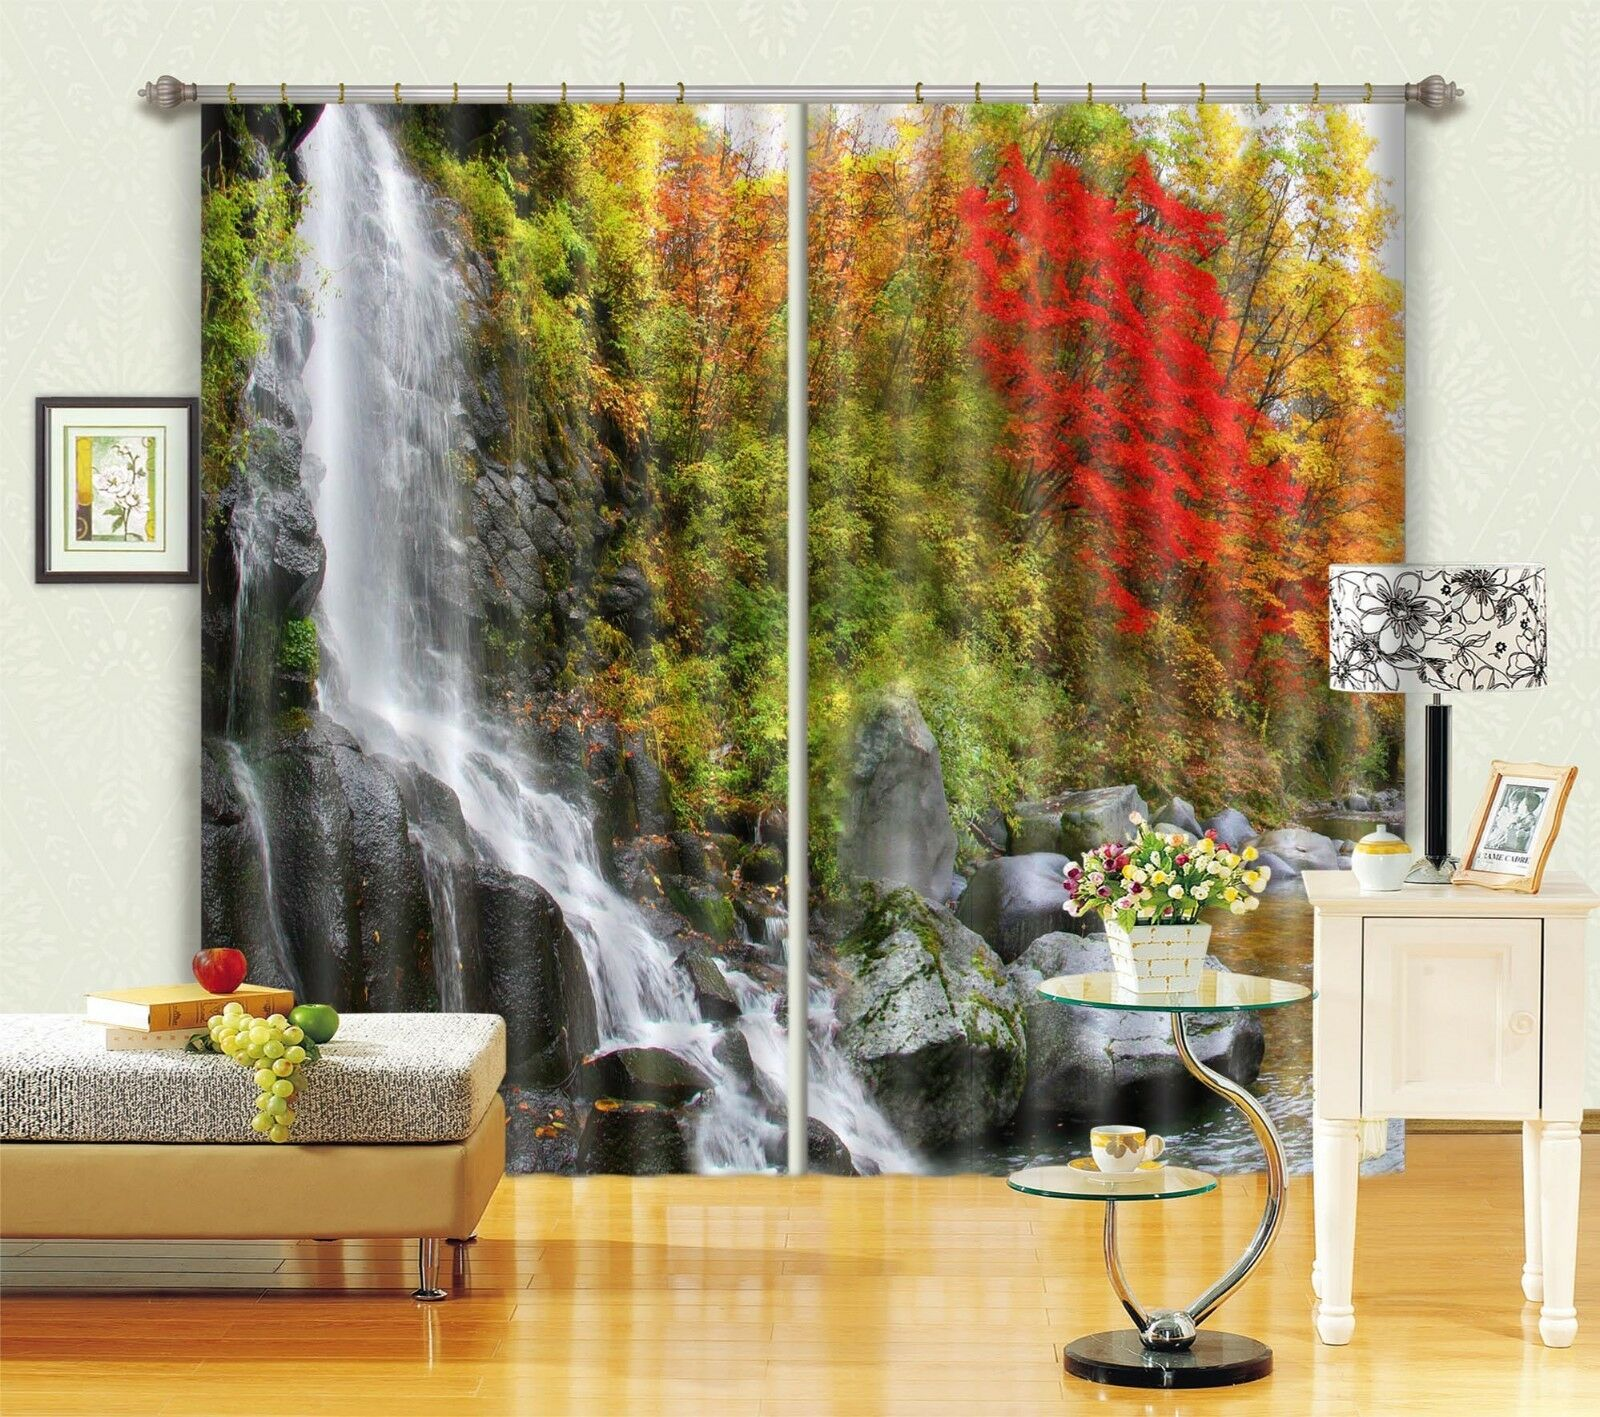 Corriente de 3D 715 Cortinas de impresión de cortina de foto Blockout Tela Cortinas Ventana CA